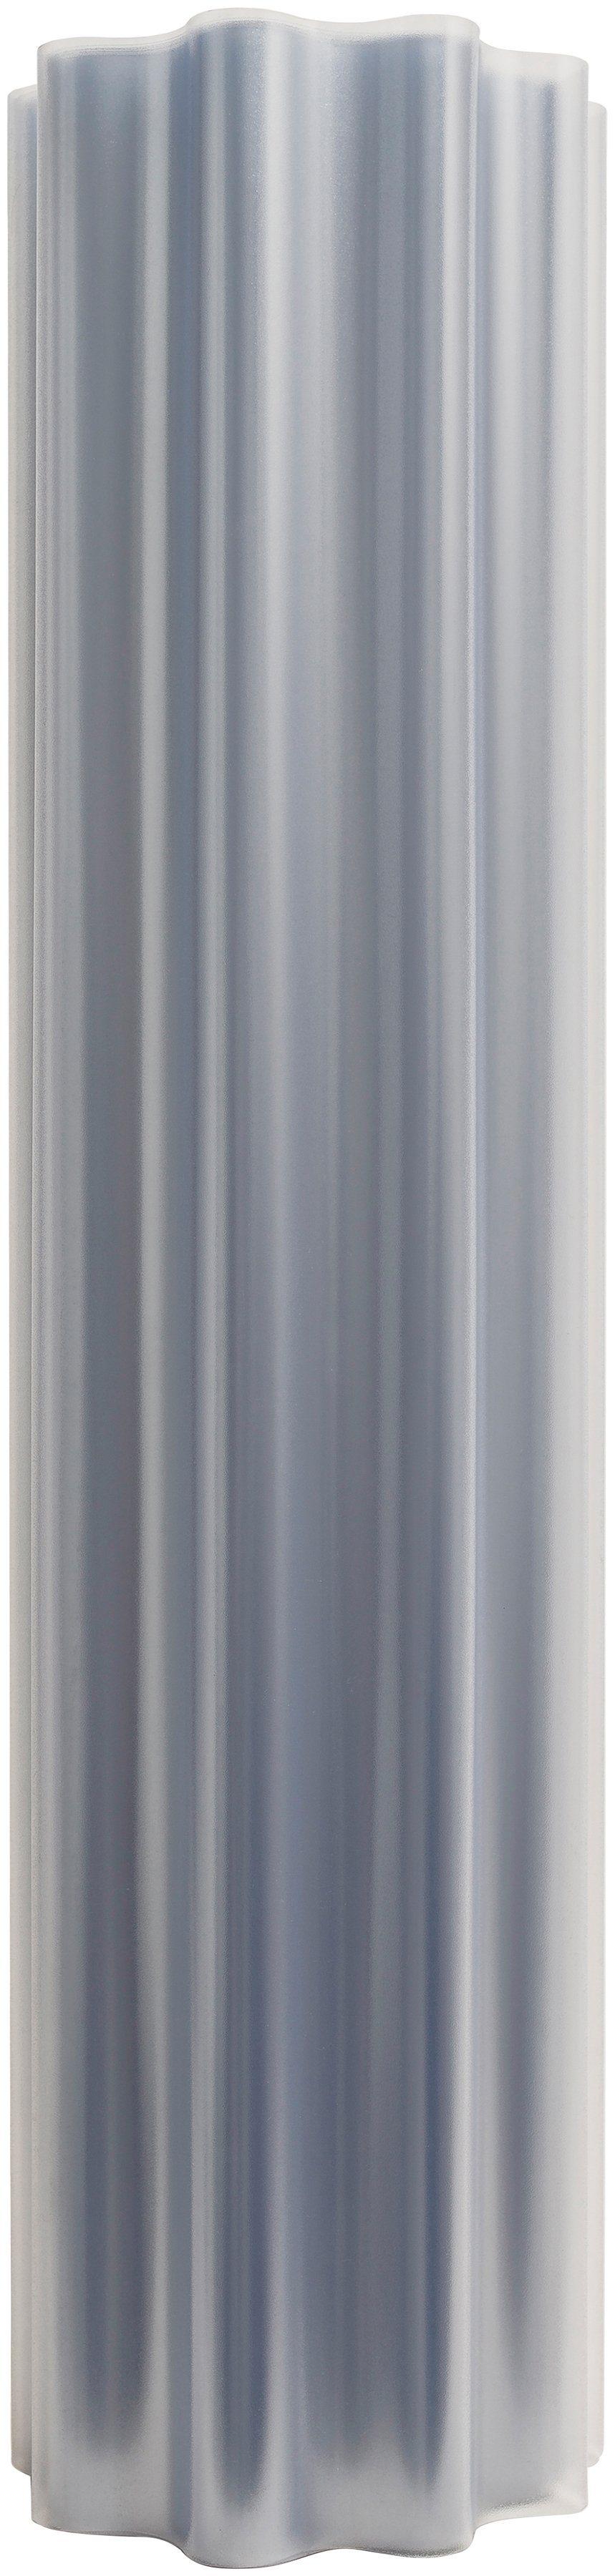 Wellplatte »Rolle HRM sinus«, mattiert, 10 m², inkl. Befestigung